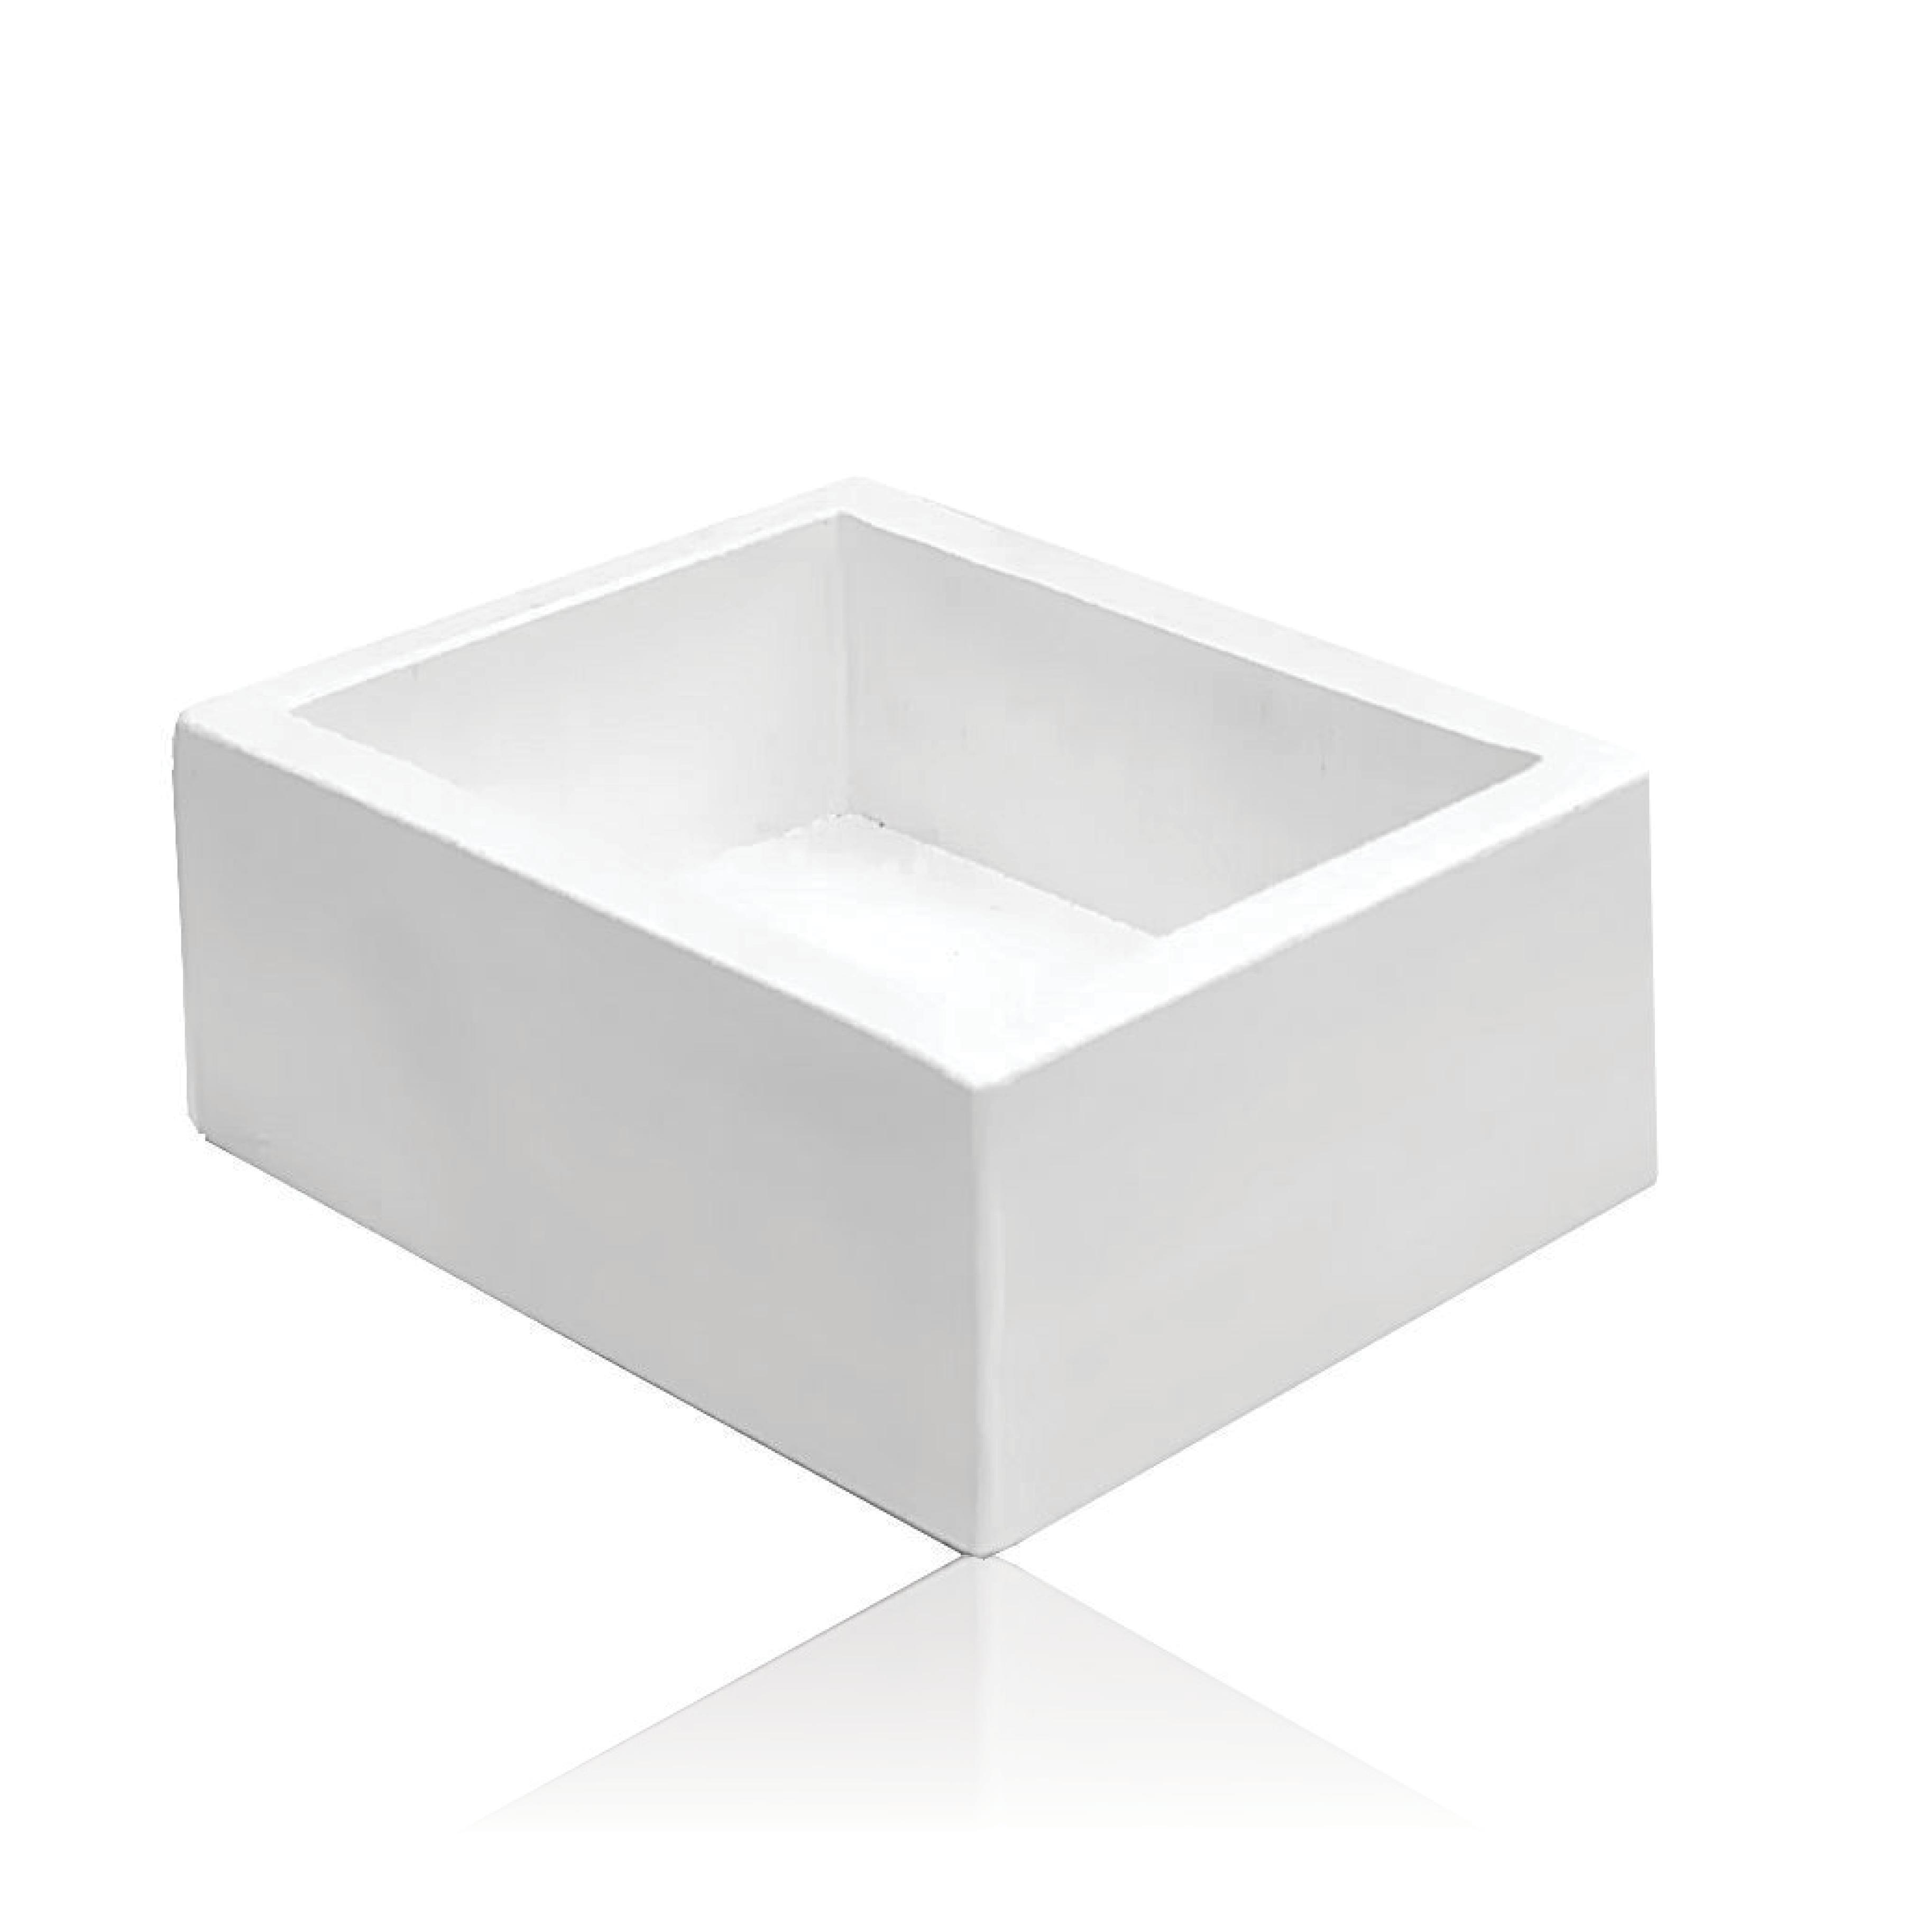 INTERMARKET BEVERAGES TEABOX WHITE SINGL3